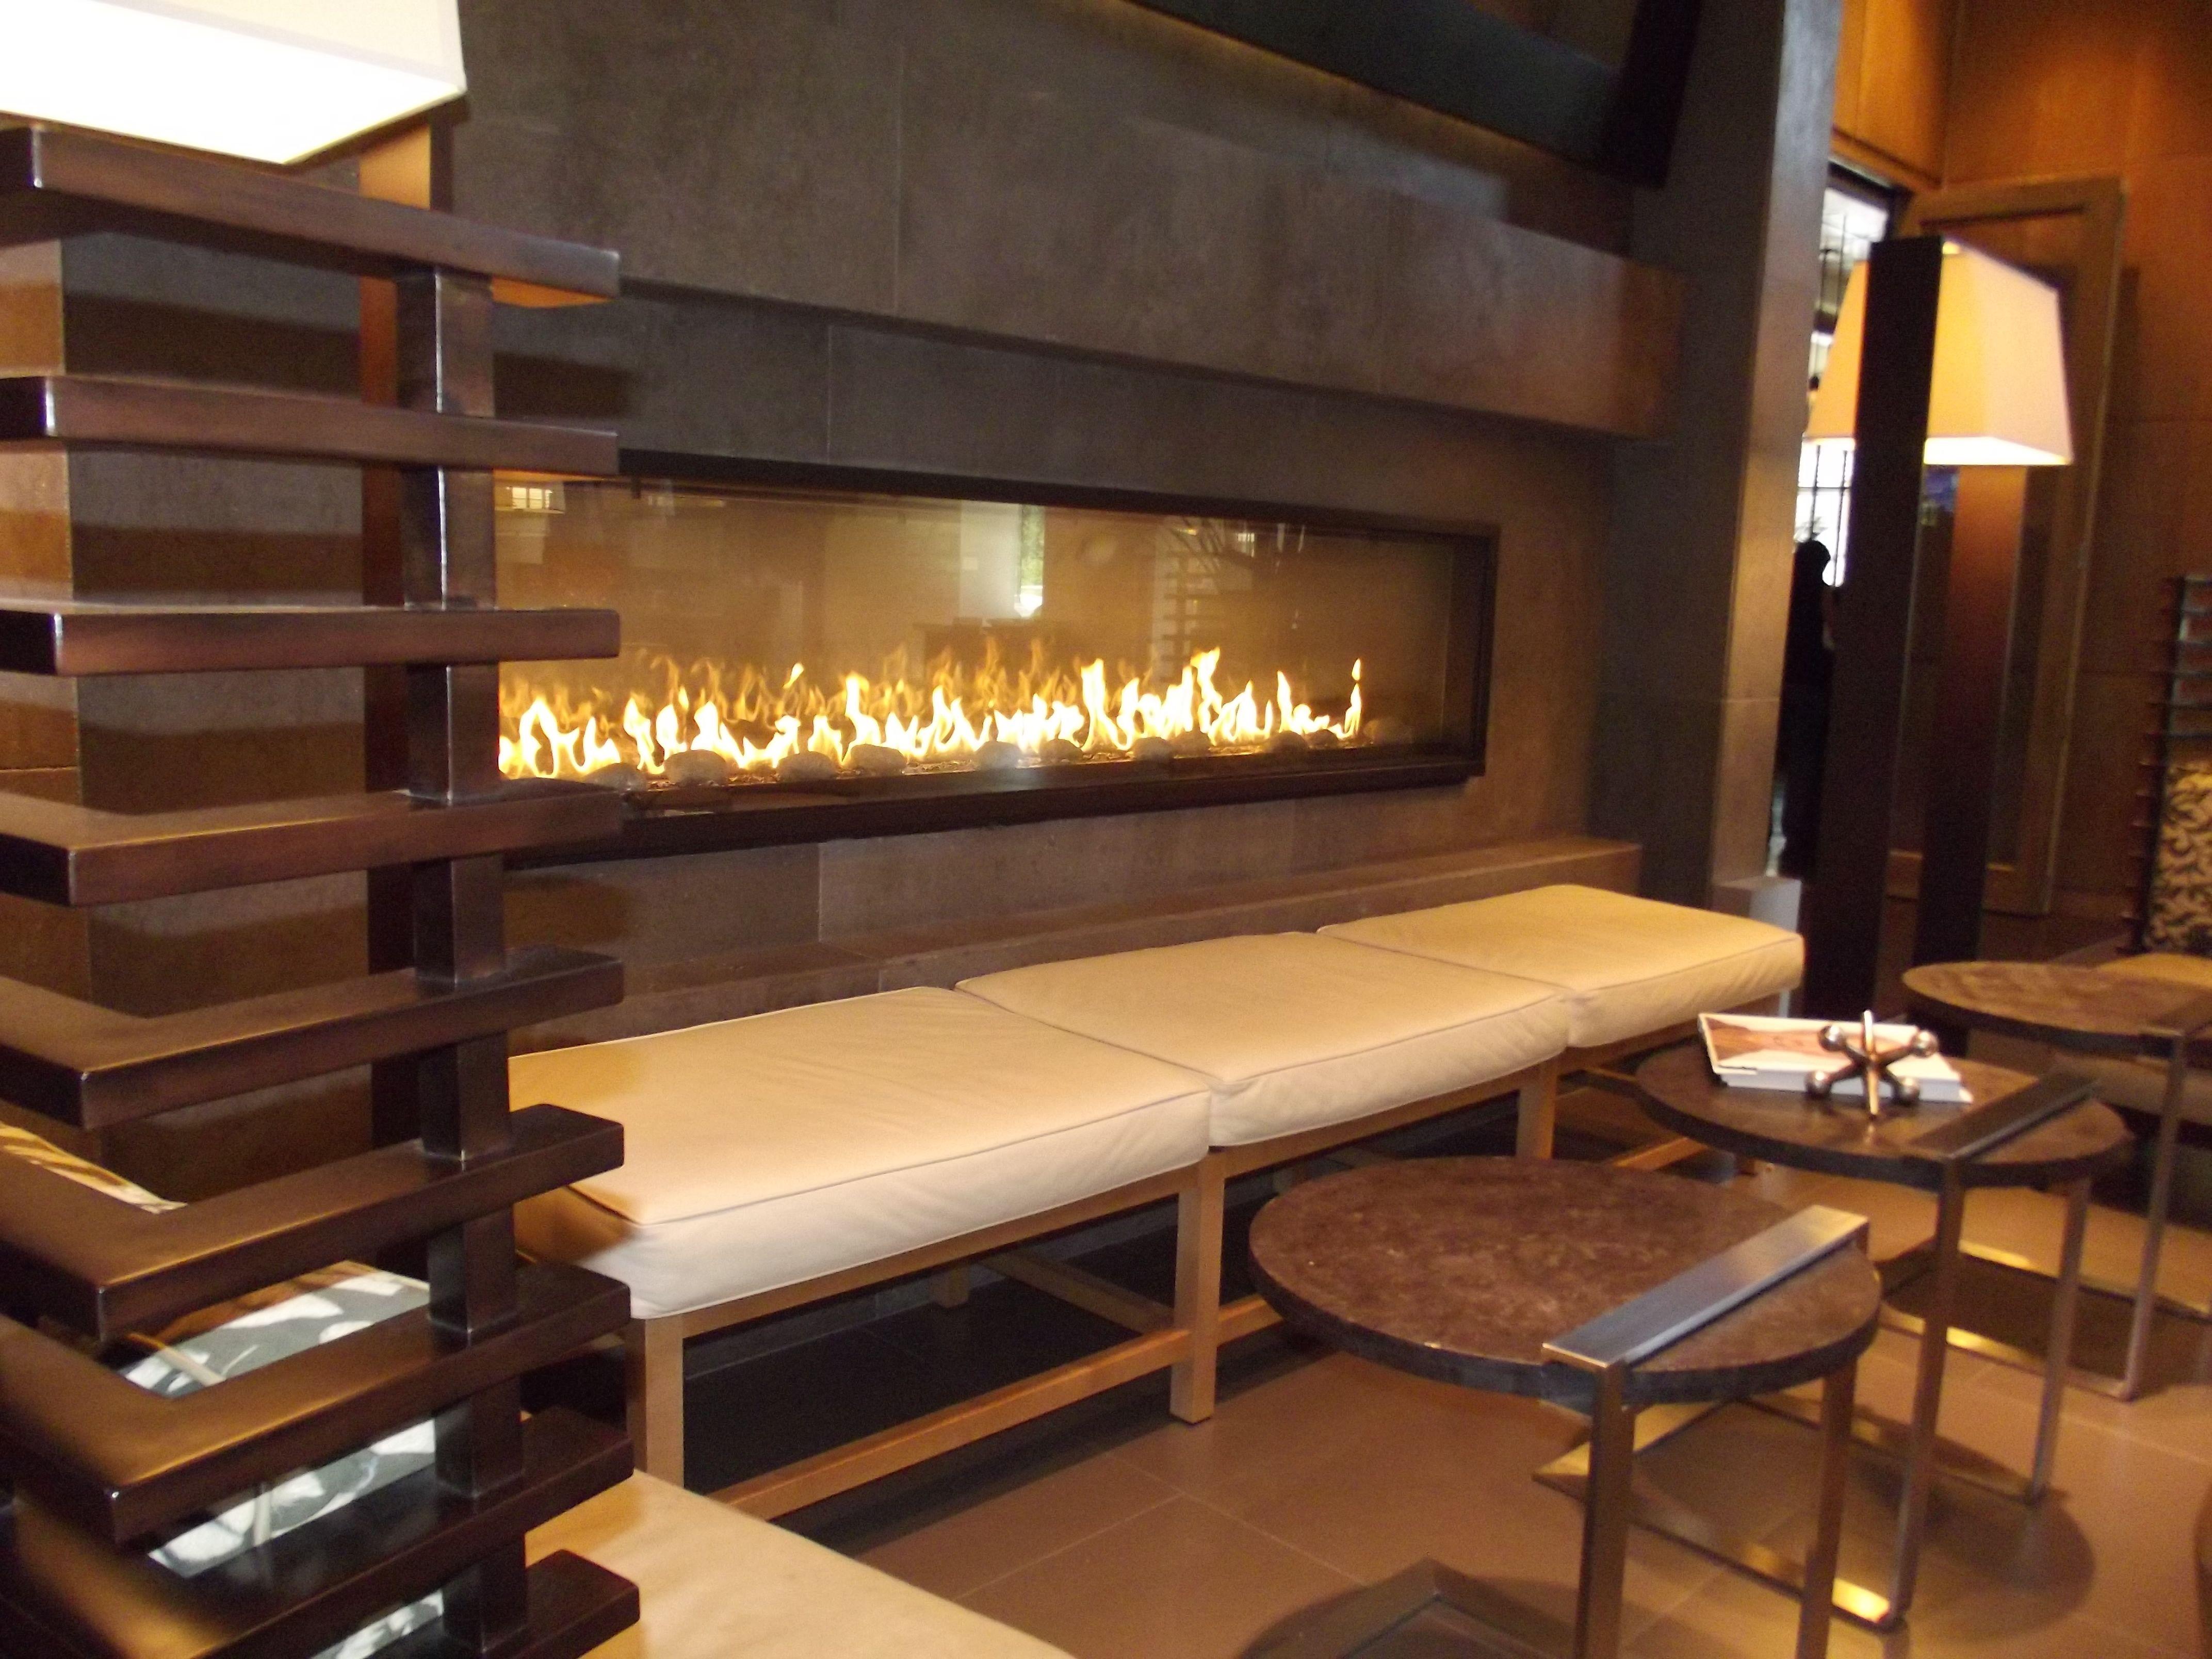 Modern Restaurant Fireplace Google Search Modern Restaurant Design Modern Restaurant Fireplace Seating